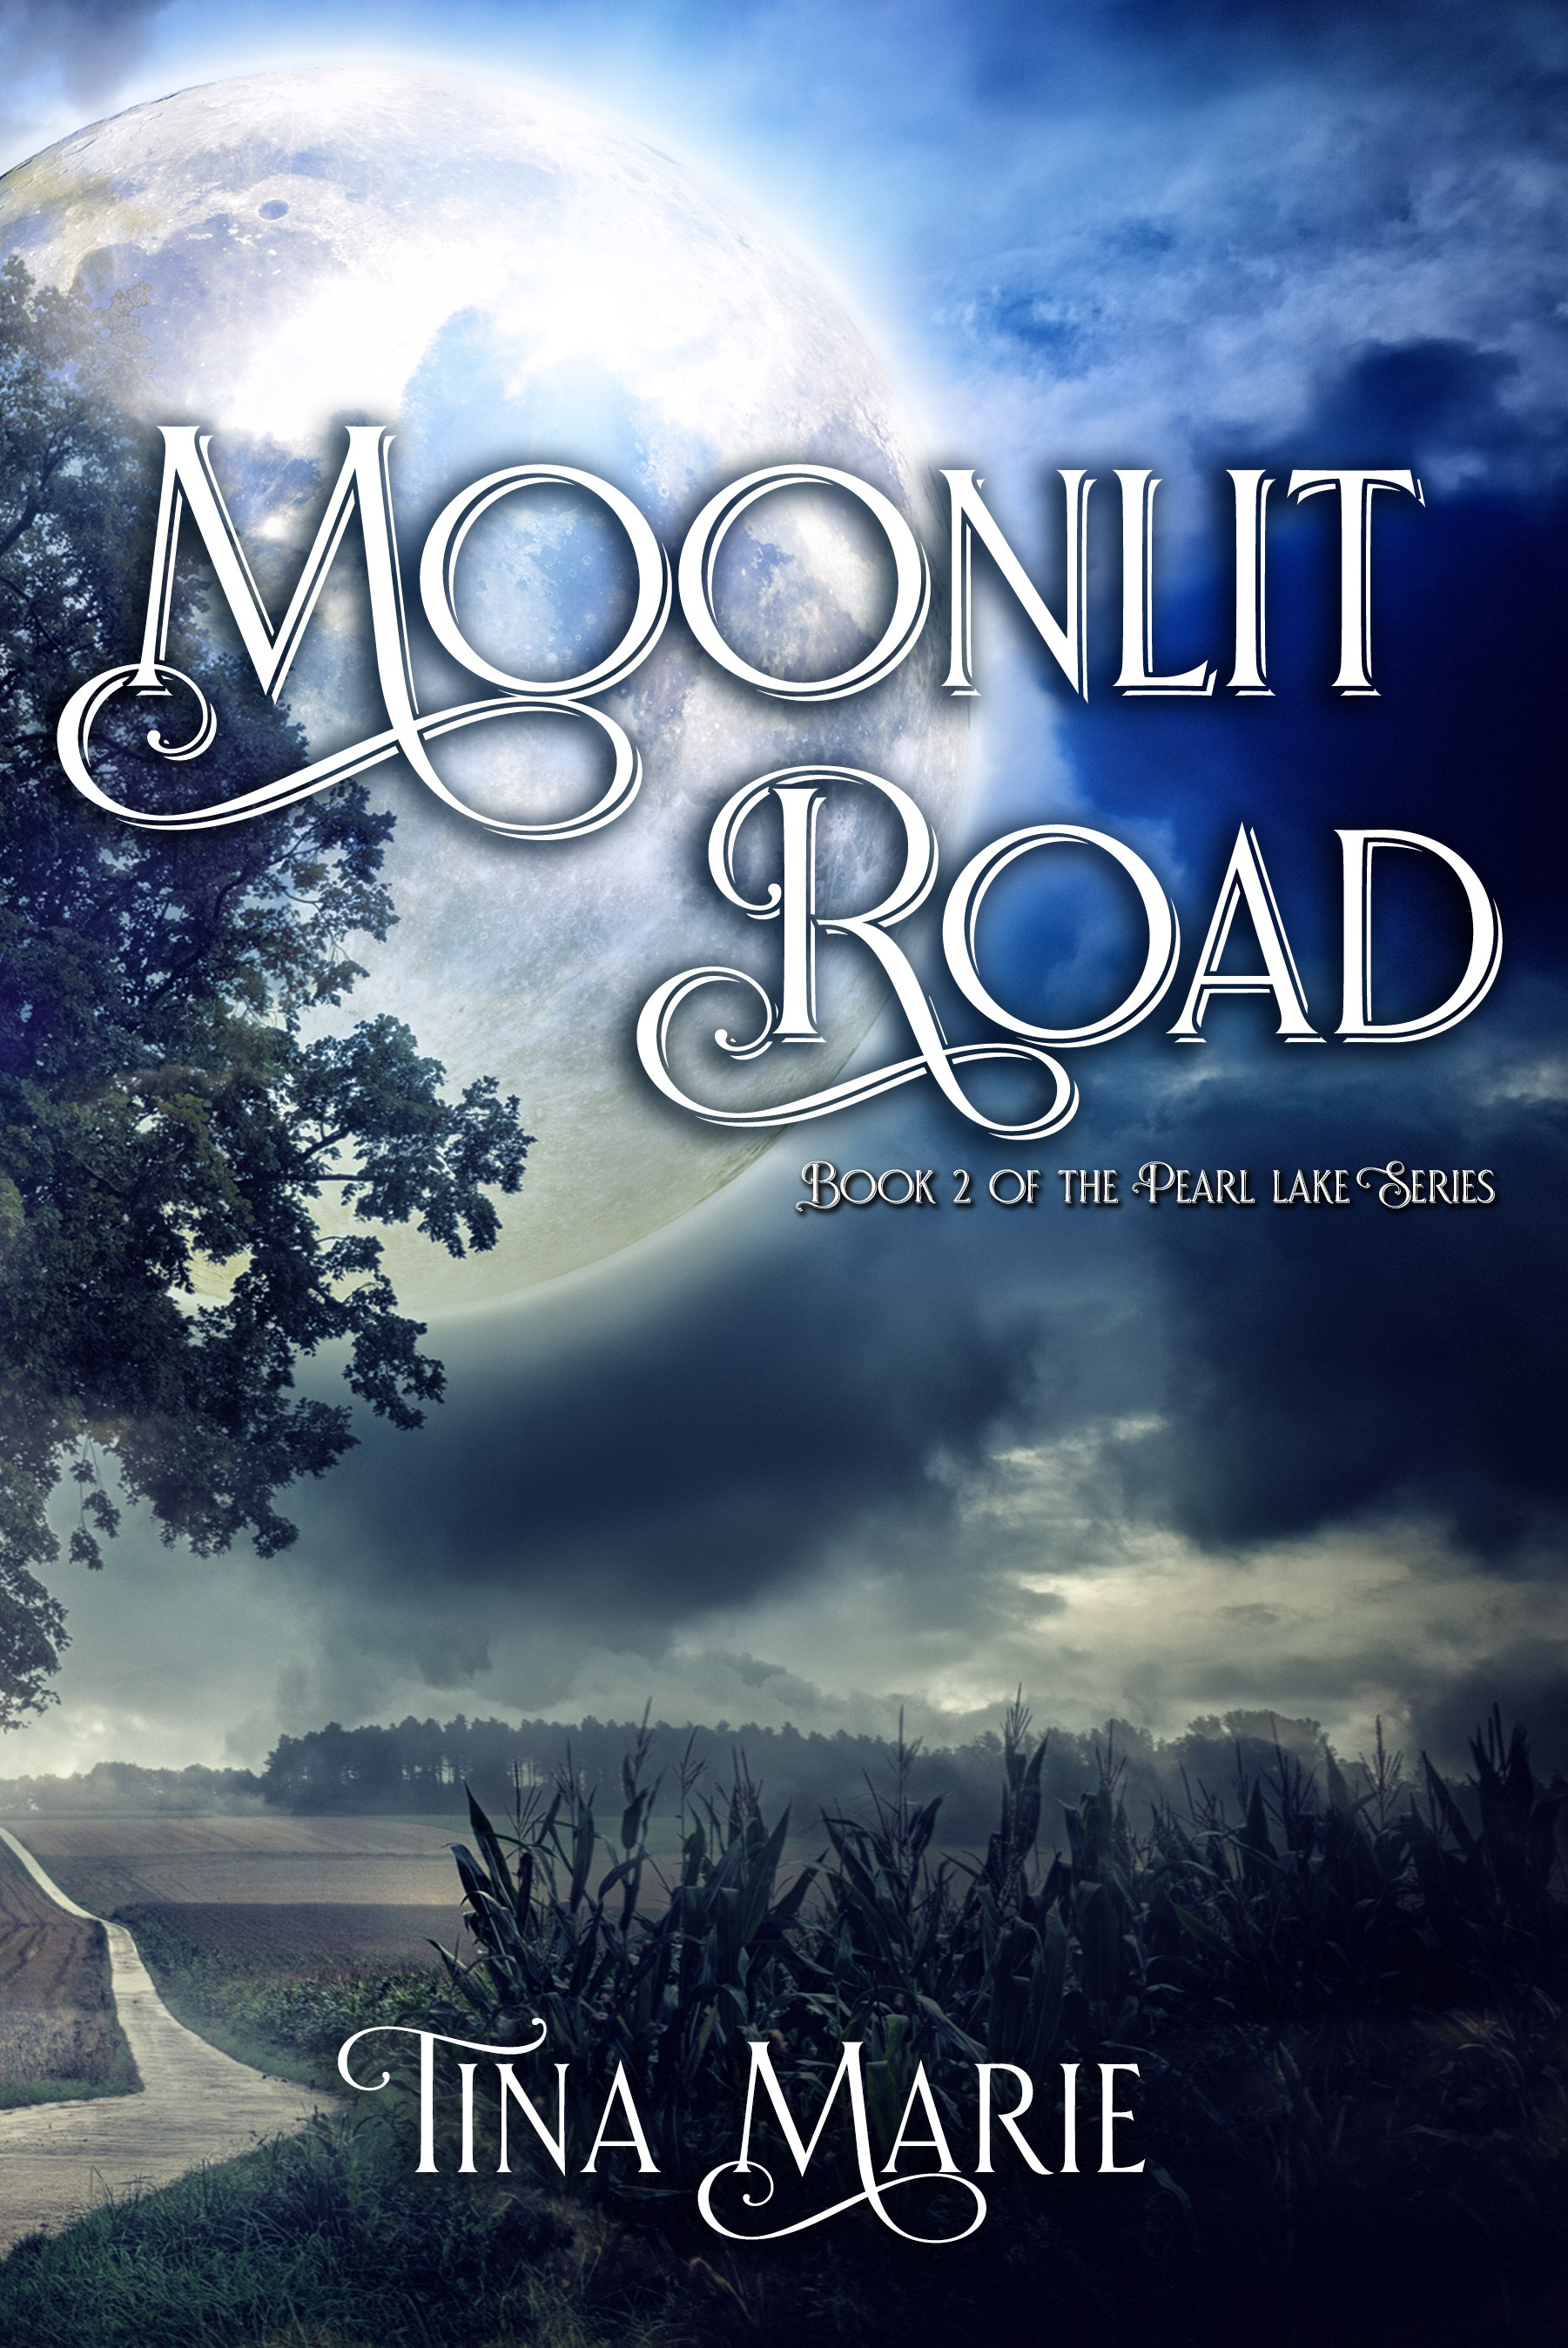 One Moonlit Road